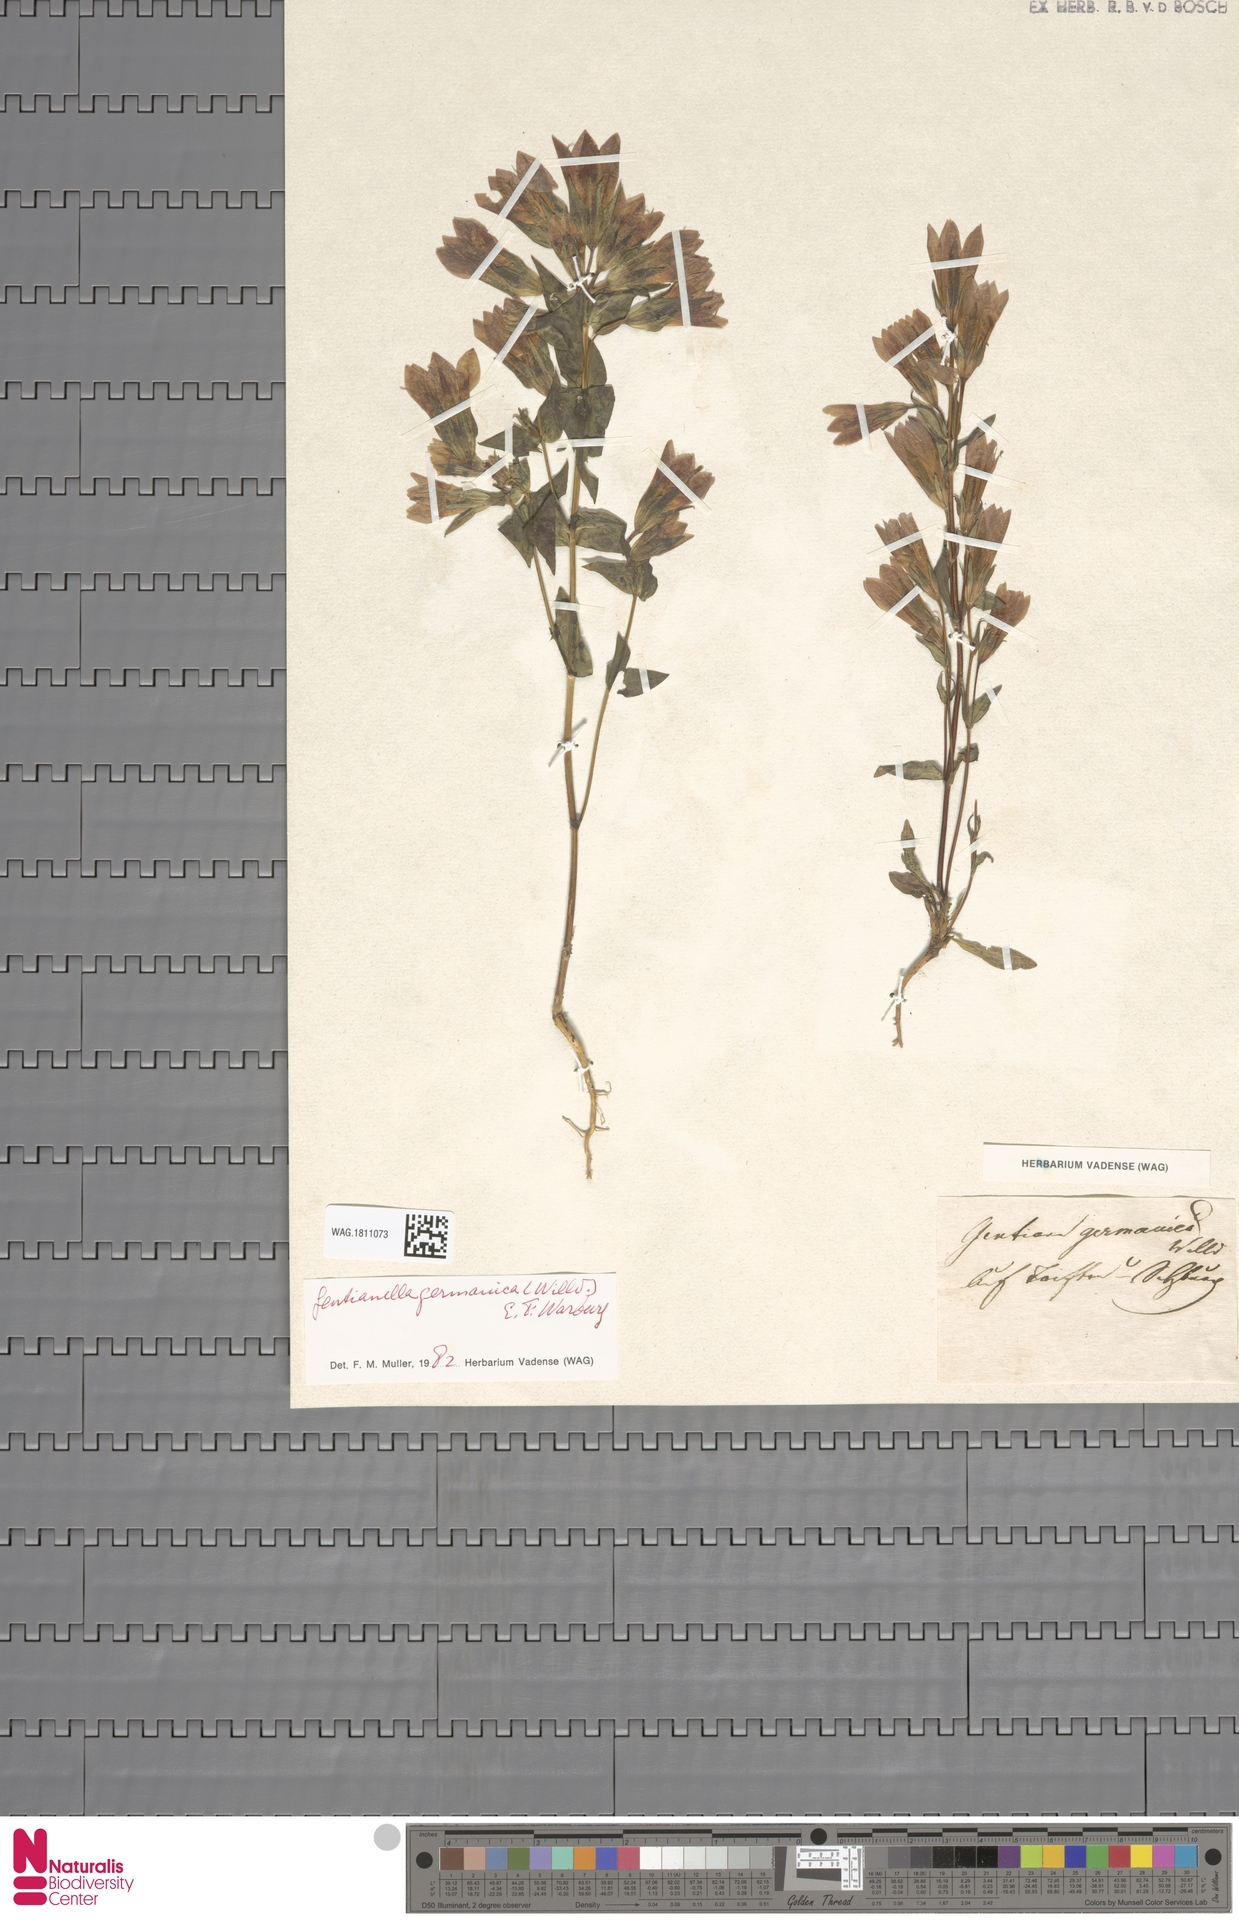 WAG.1811073 | Gentianella germanica (Willd.) E.F.Warb.